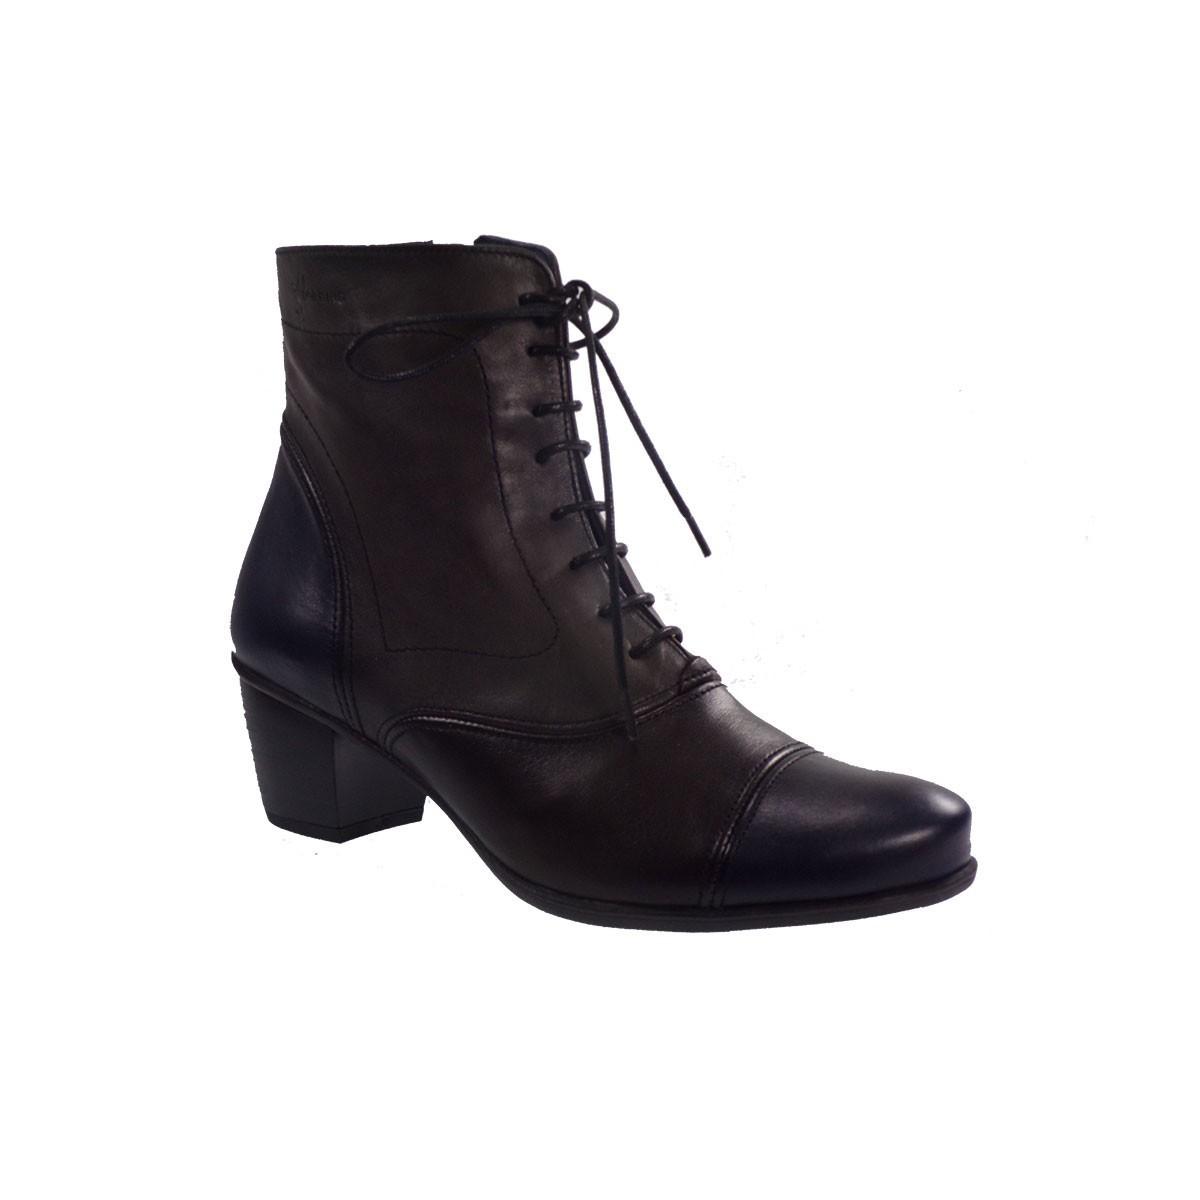 Dorking Γυναικεία Παπούτσια Μποτάκια D72555USSL Μπλέ Δέρμα